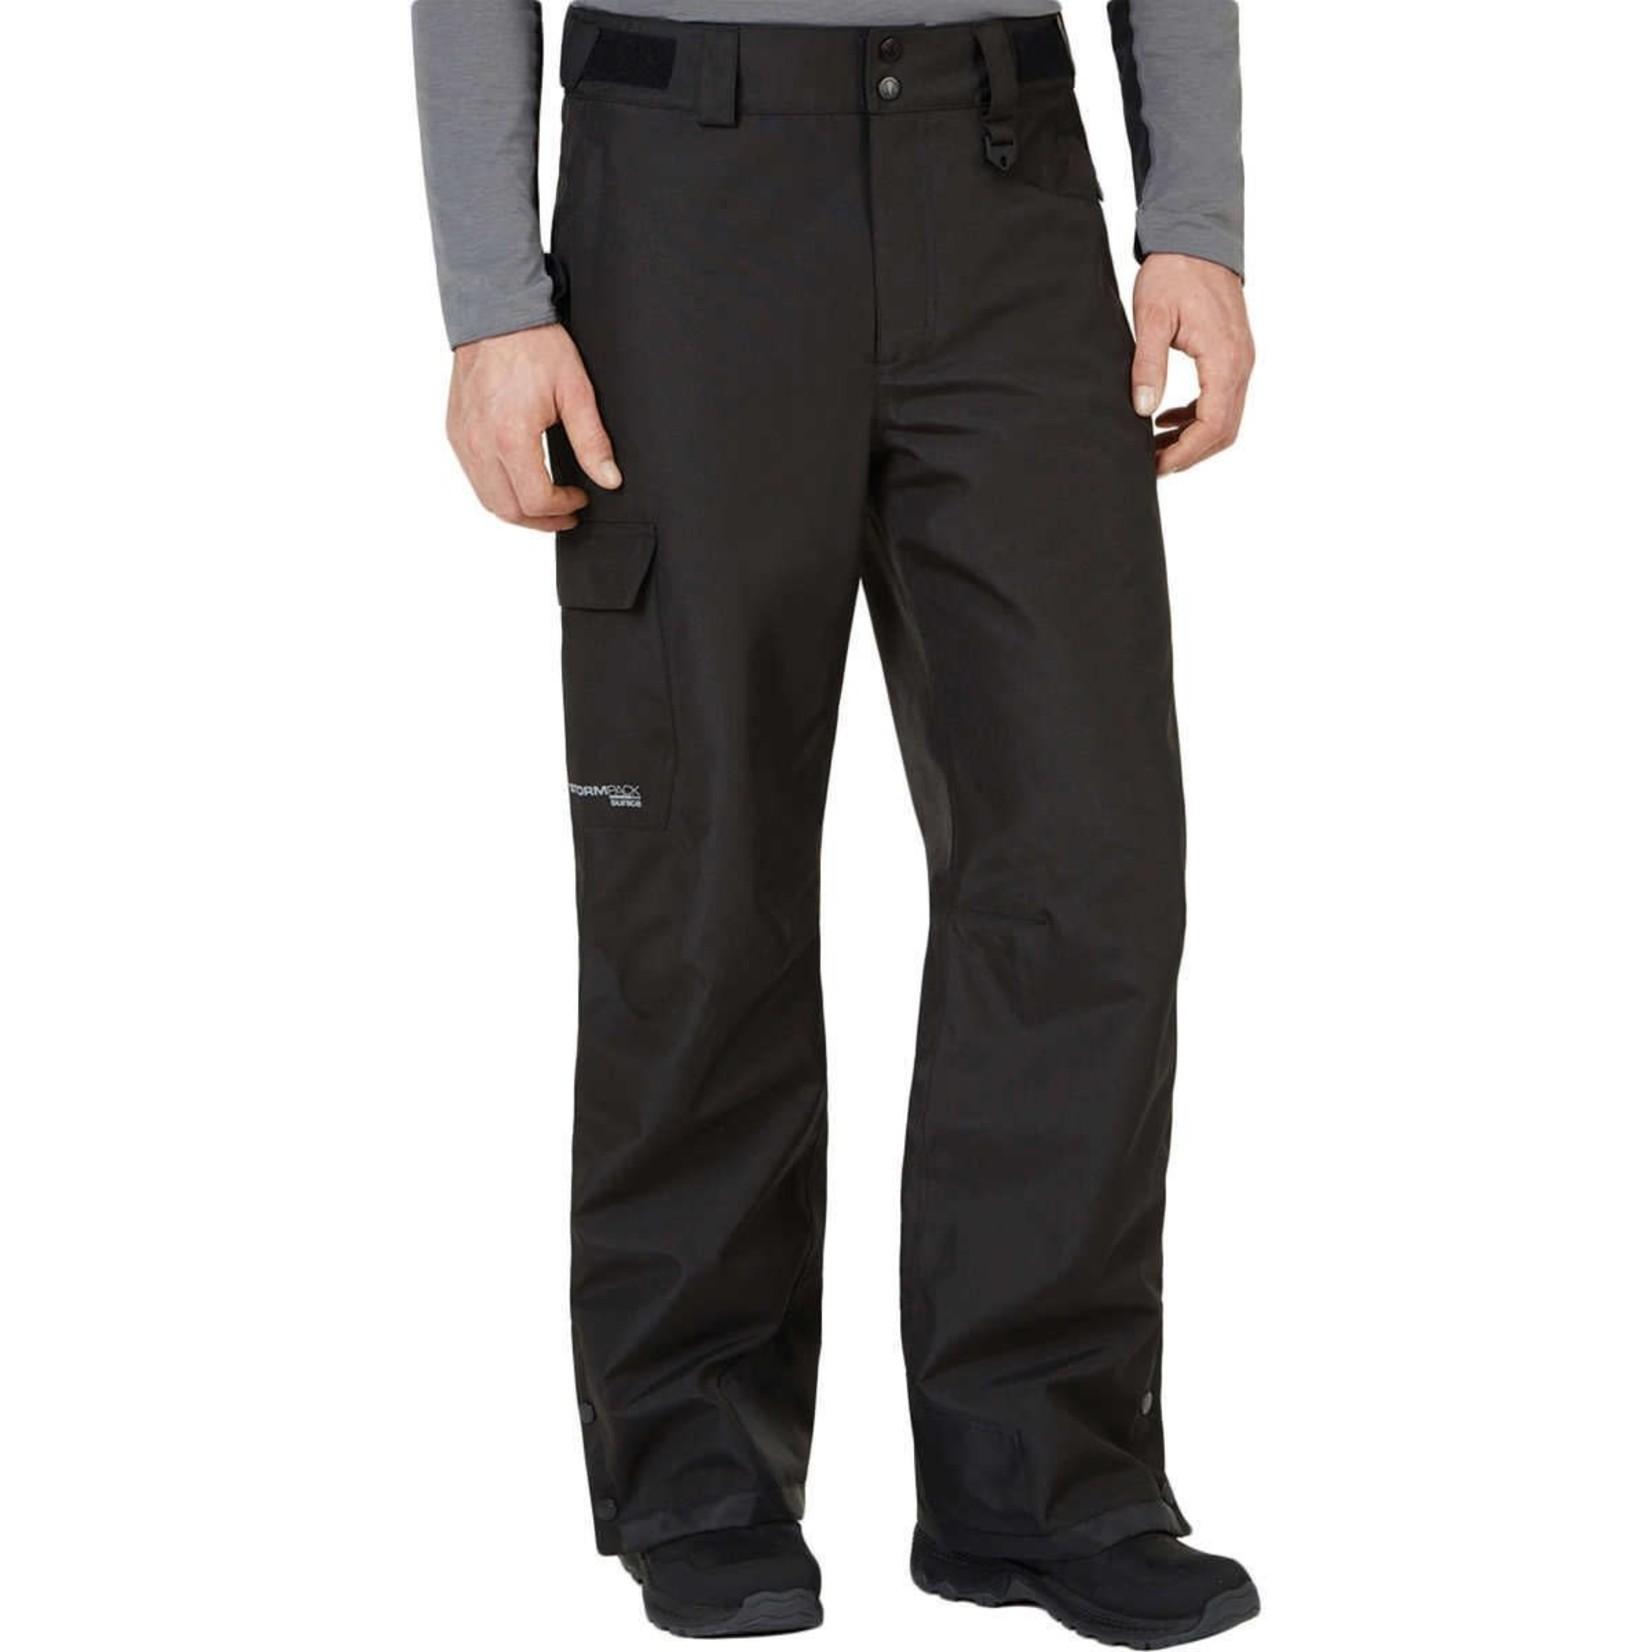 Sunice Stormpack Men's Snow Pants